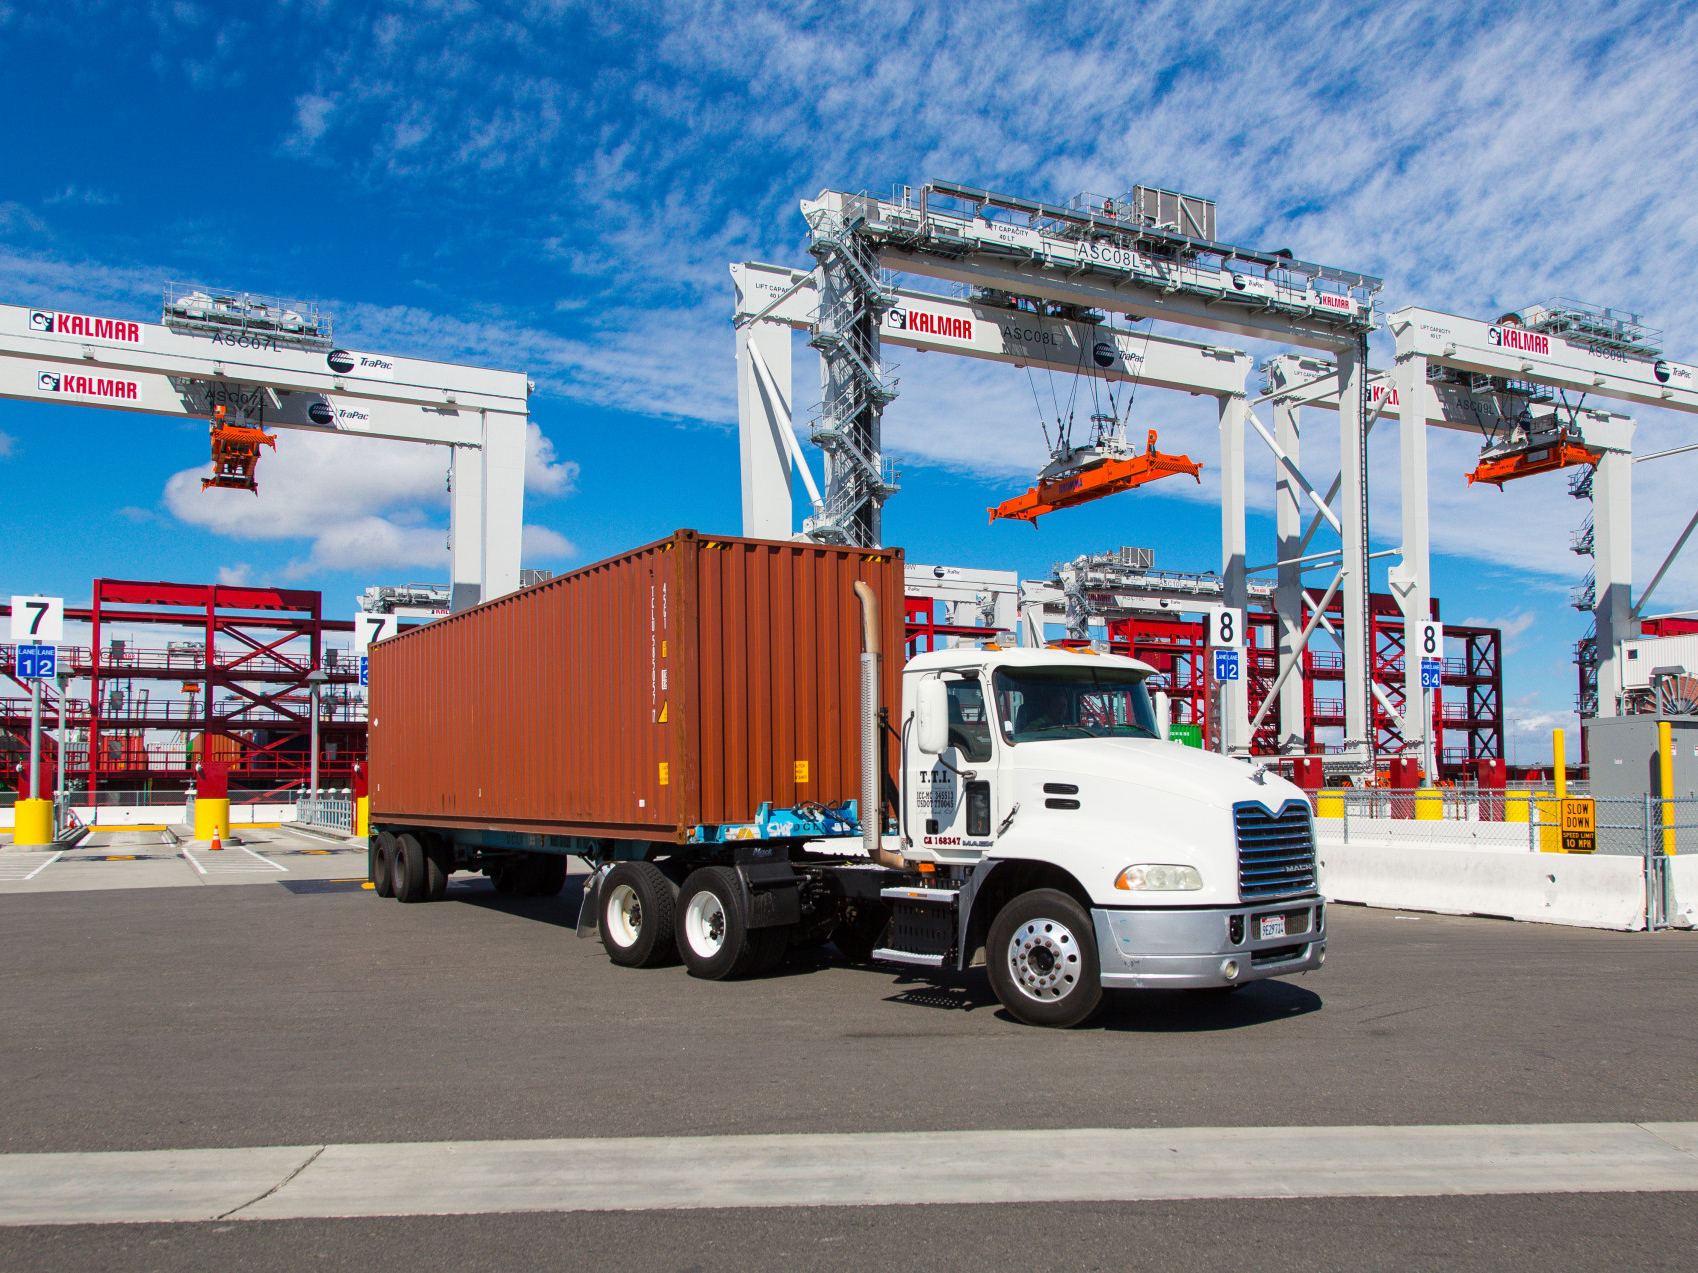 0210 freightforwardersvalue